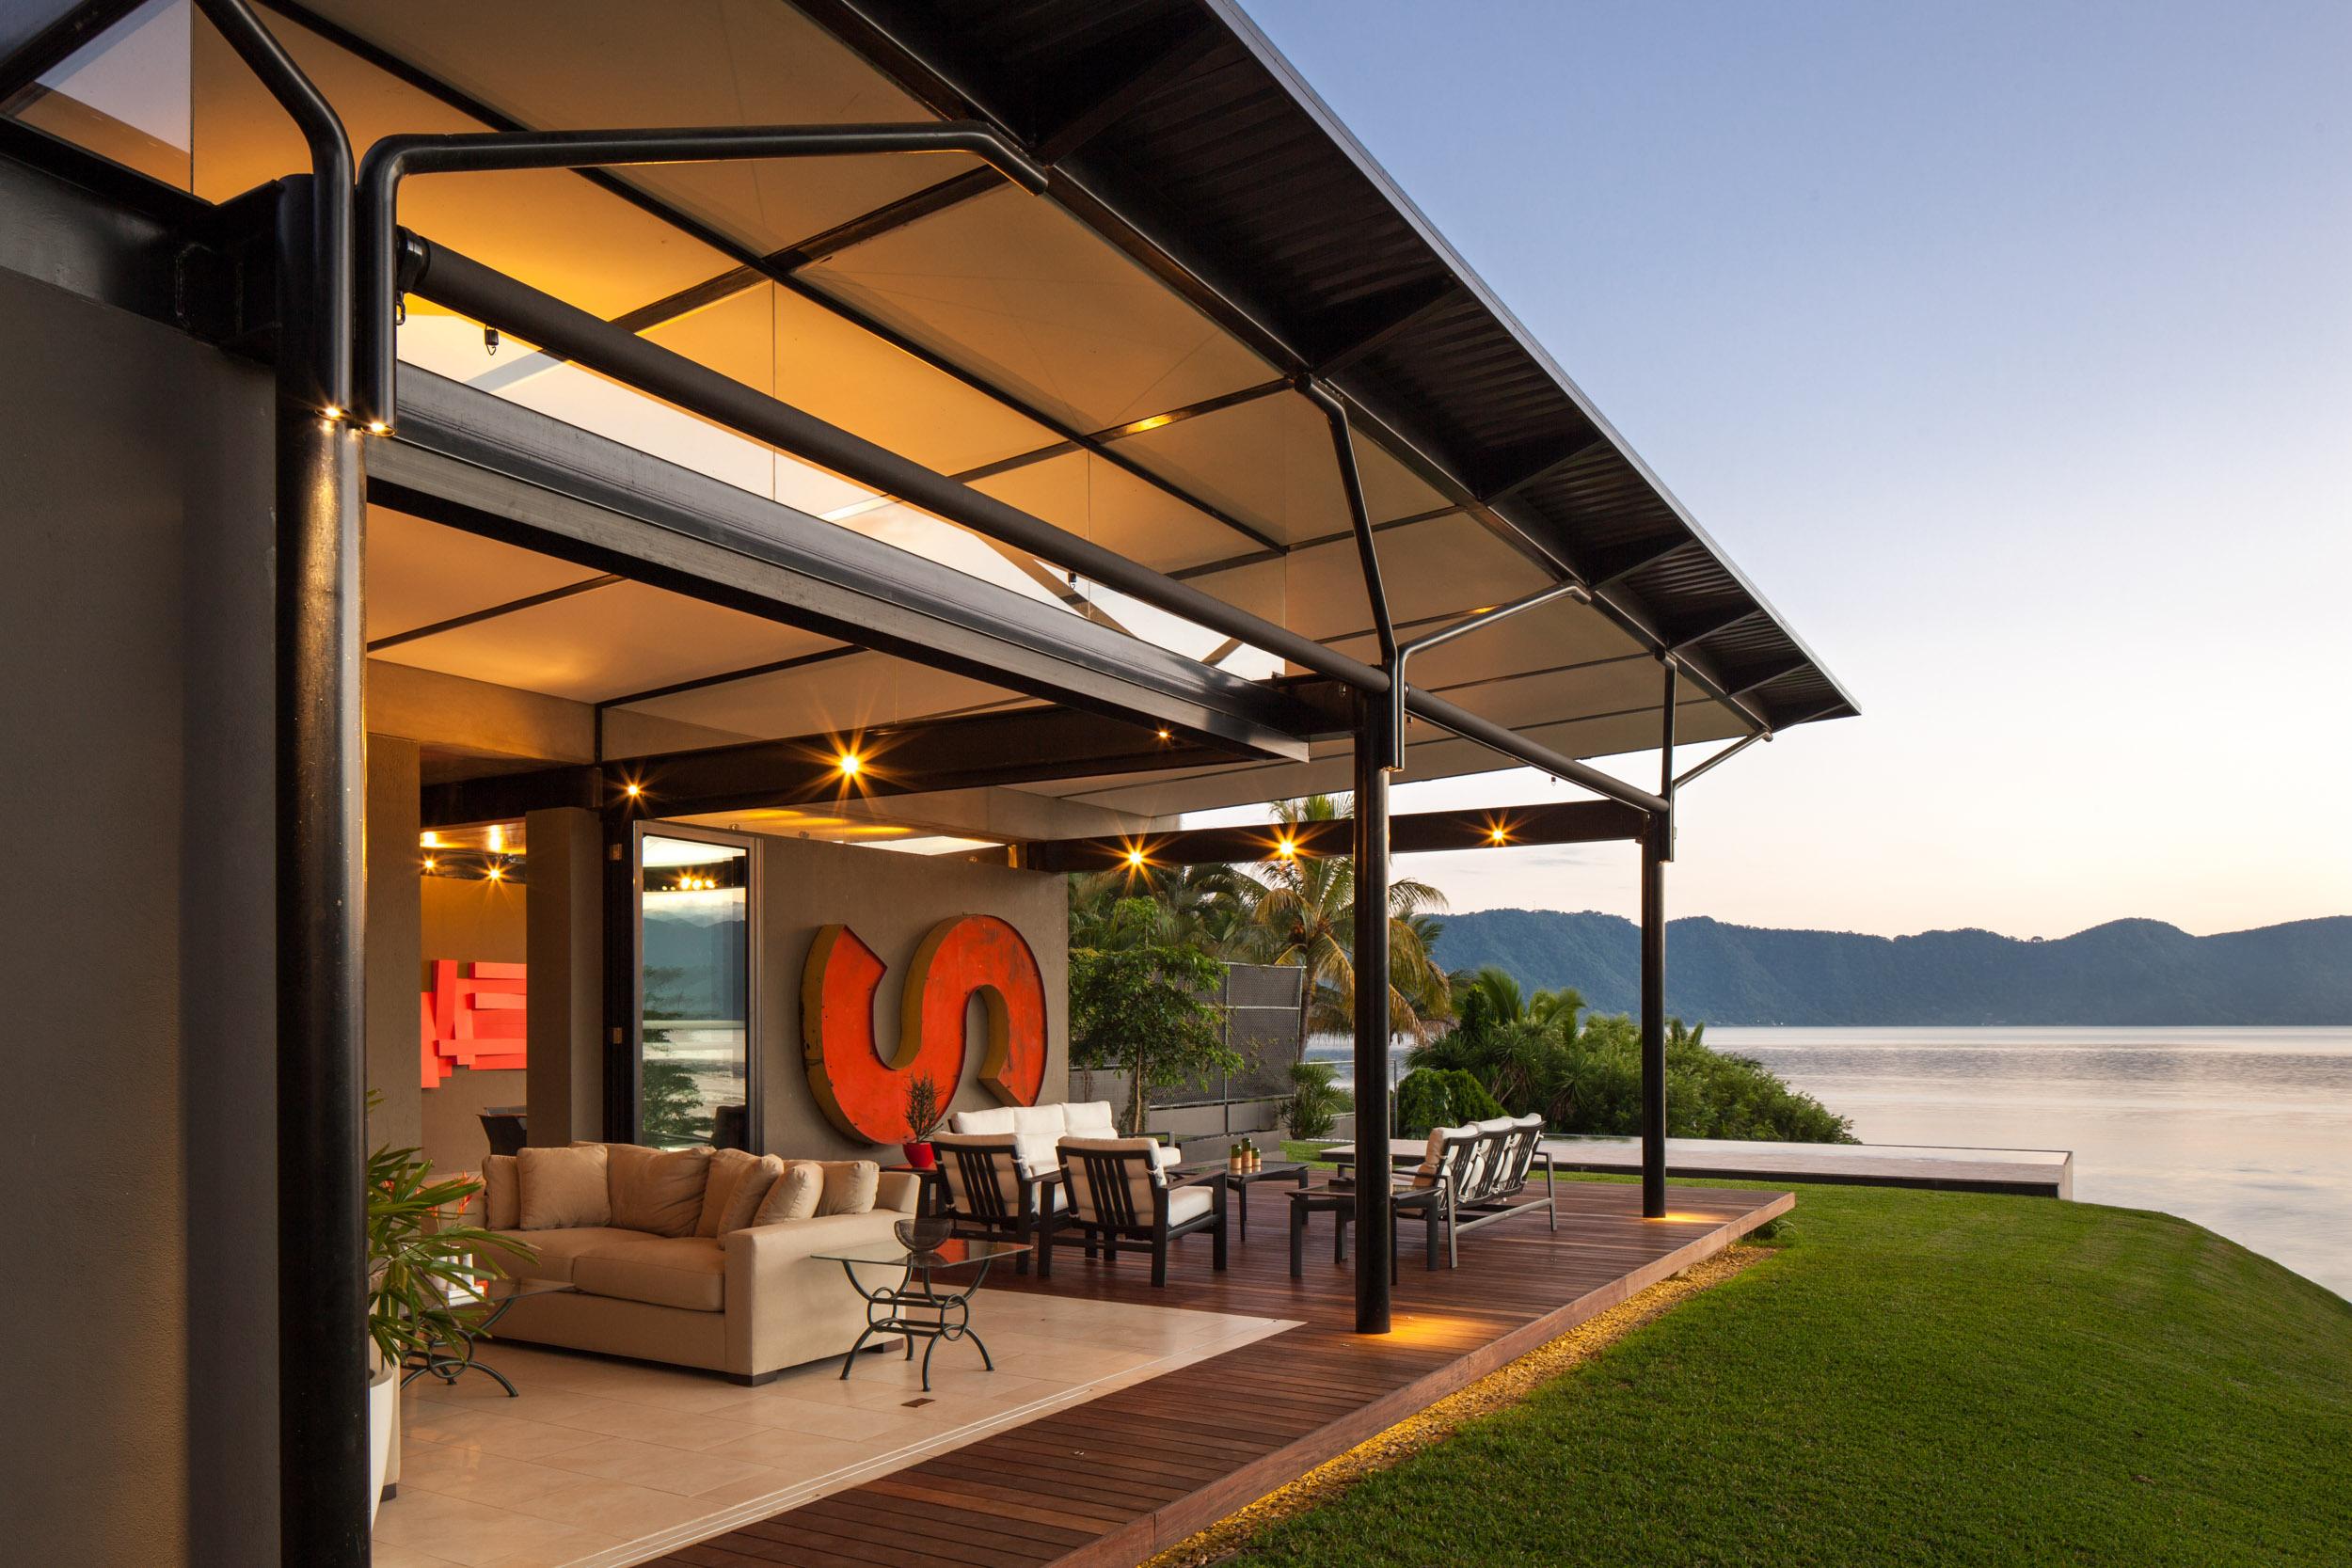 Jason_Bax_SQ_Lake_House_El_Salvador_Architecture_MG_0256.jpg